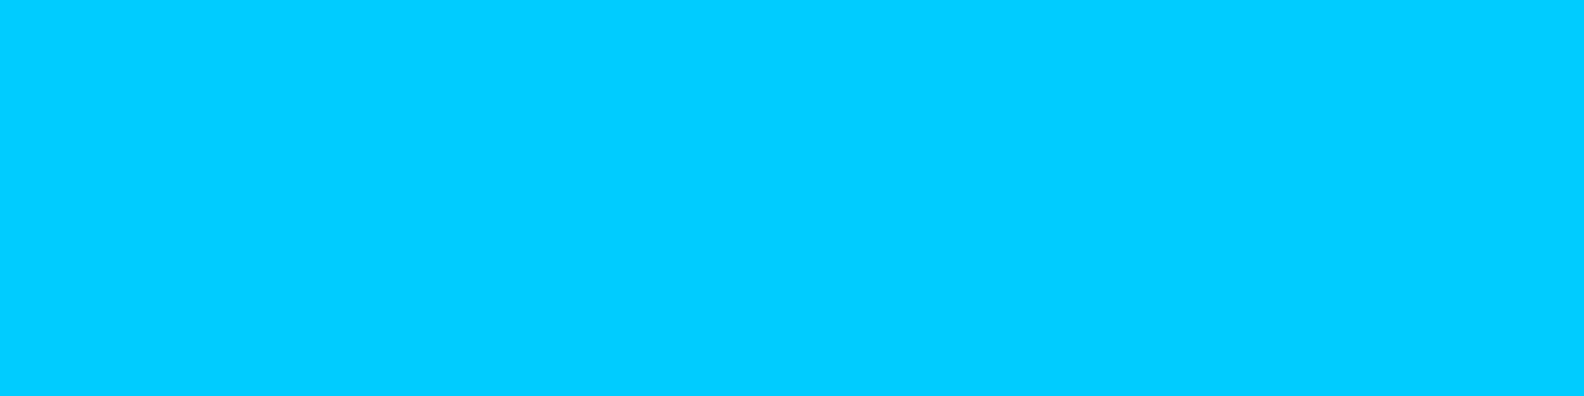 1584x396 Vivid Sky Blue Solid Color Background